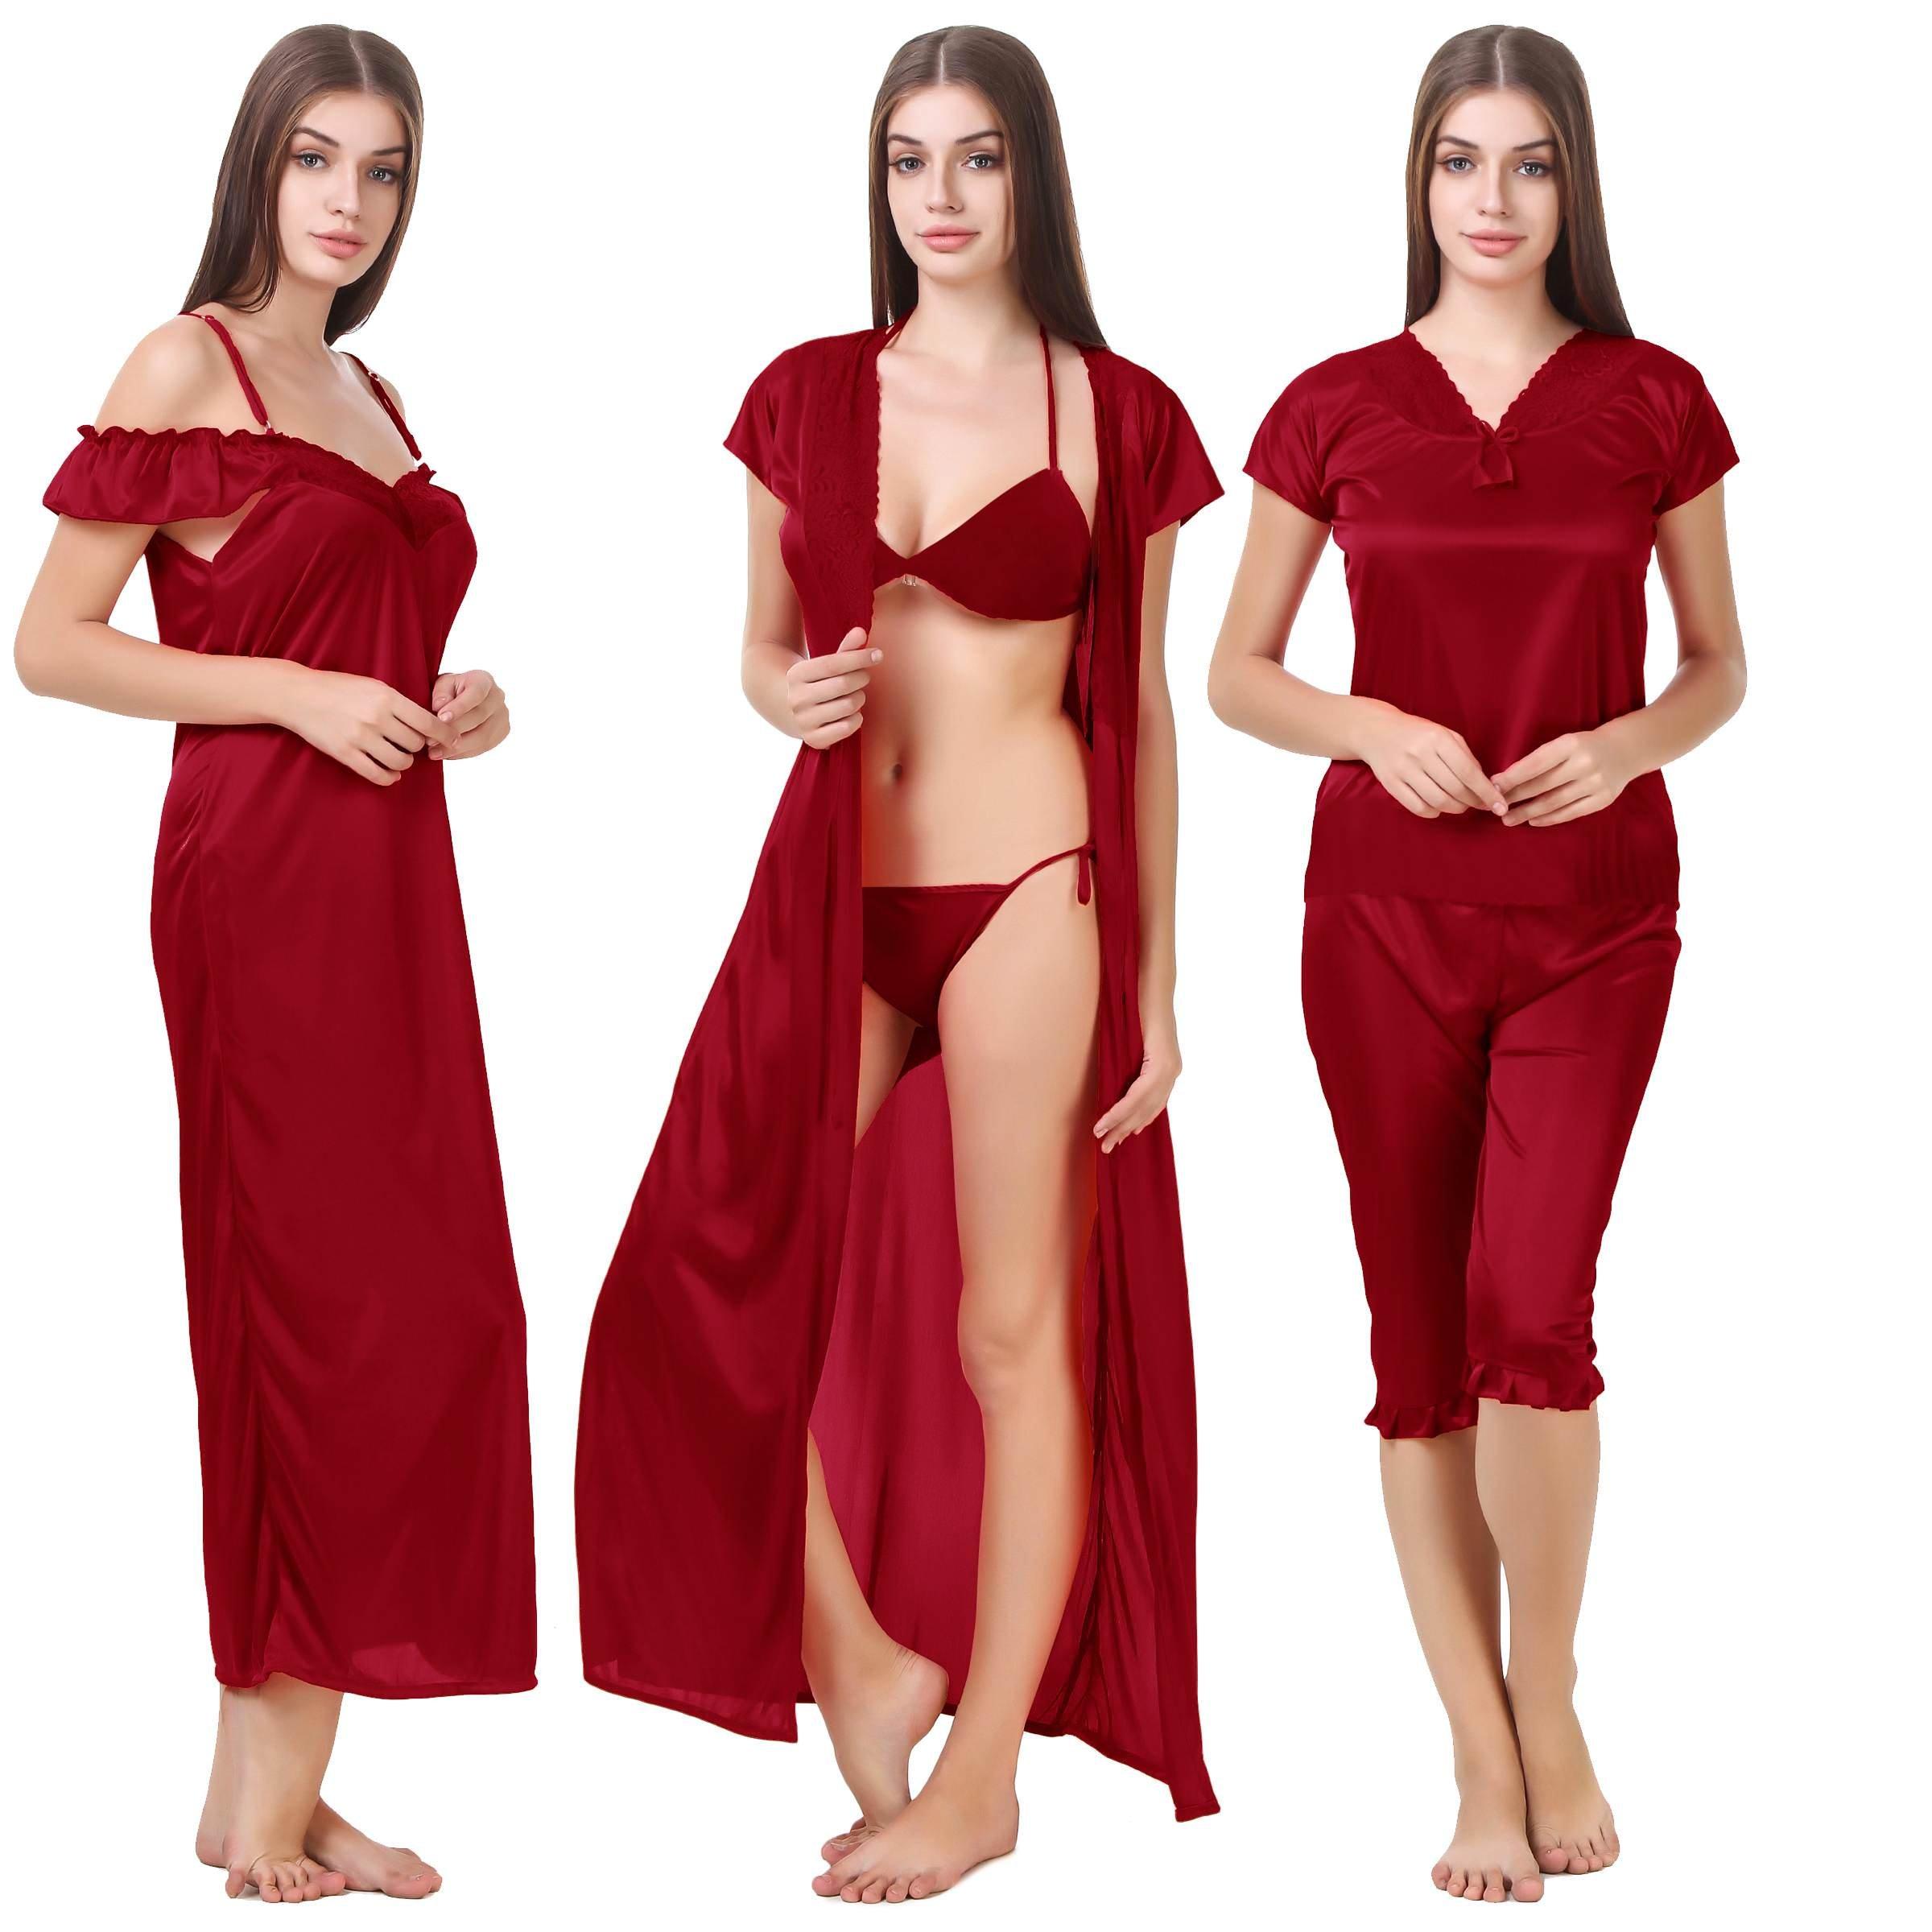 9528d736e MILIT Satin Nightwear 6 Pcs Set of Nighty